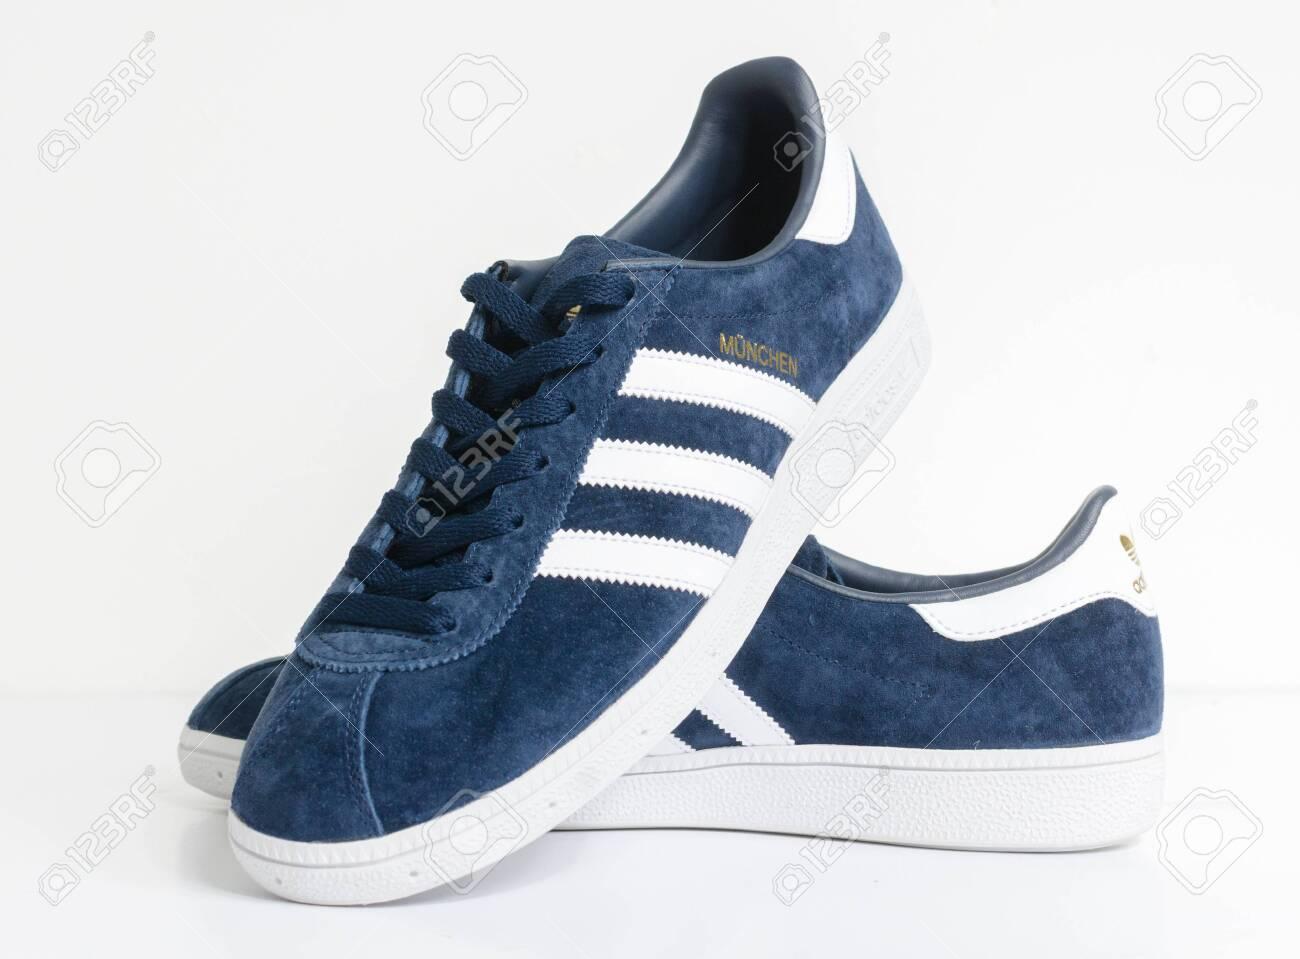 Organo Estación de ferrocarril Parcial  London, England, 05/05/2018 Adidas Munchen Gazelle Vintage Sneaker.. Stock  Photo, Picture And Royalty Free Image. Image 135656536.